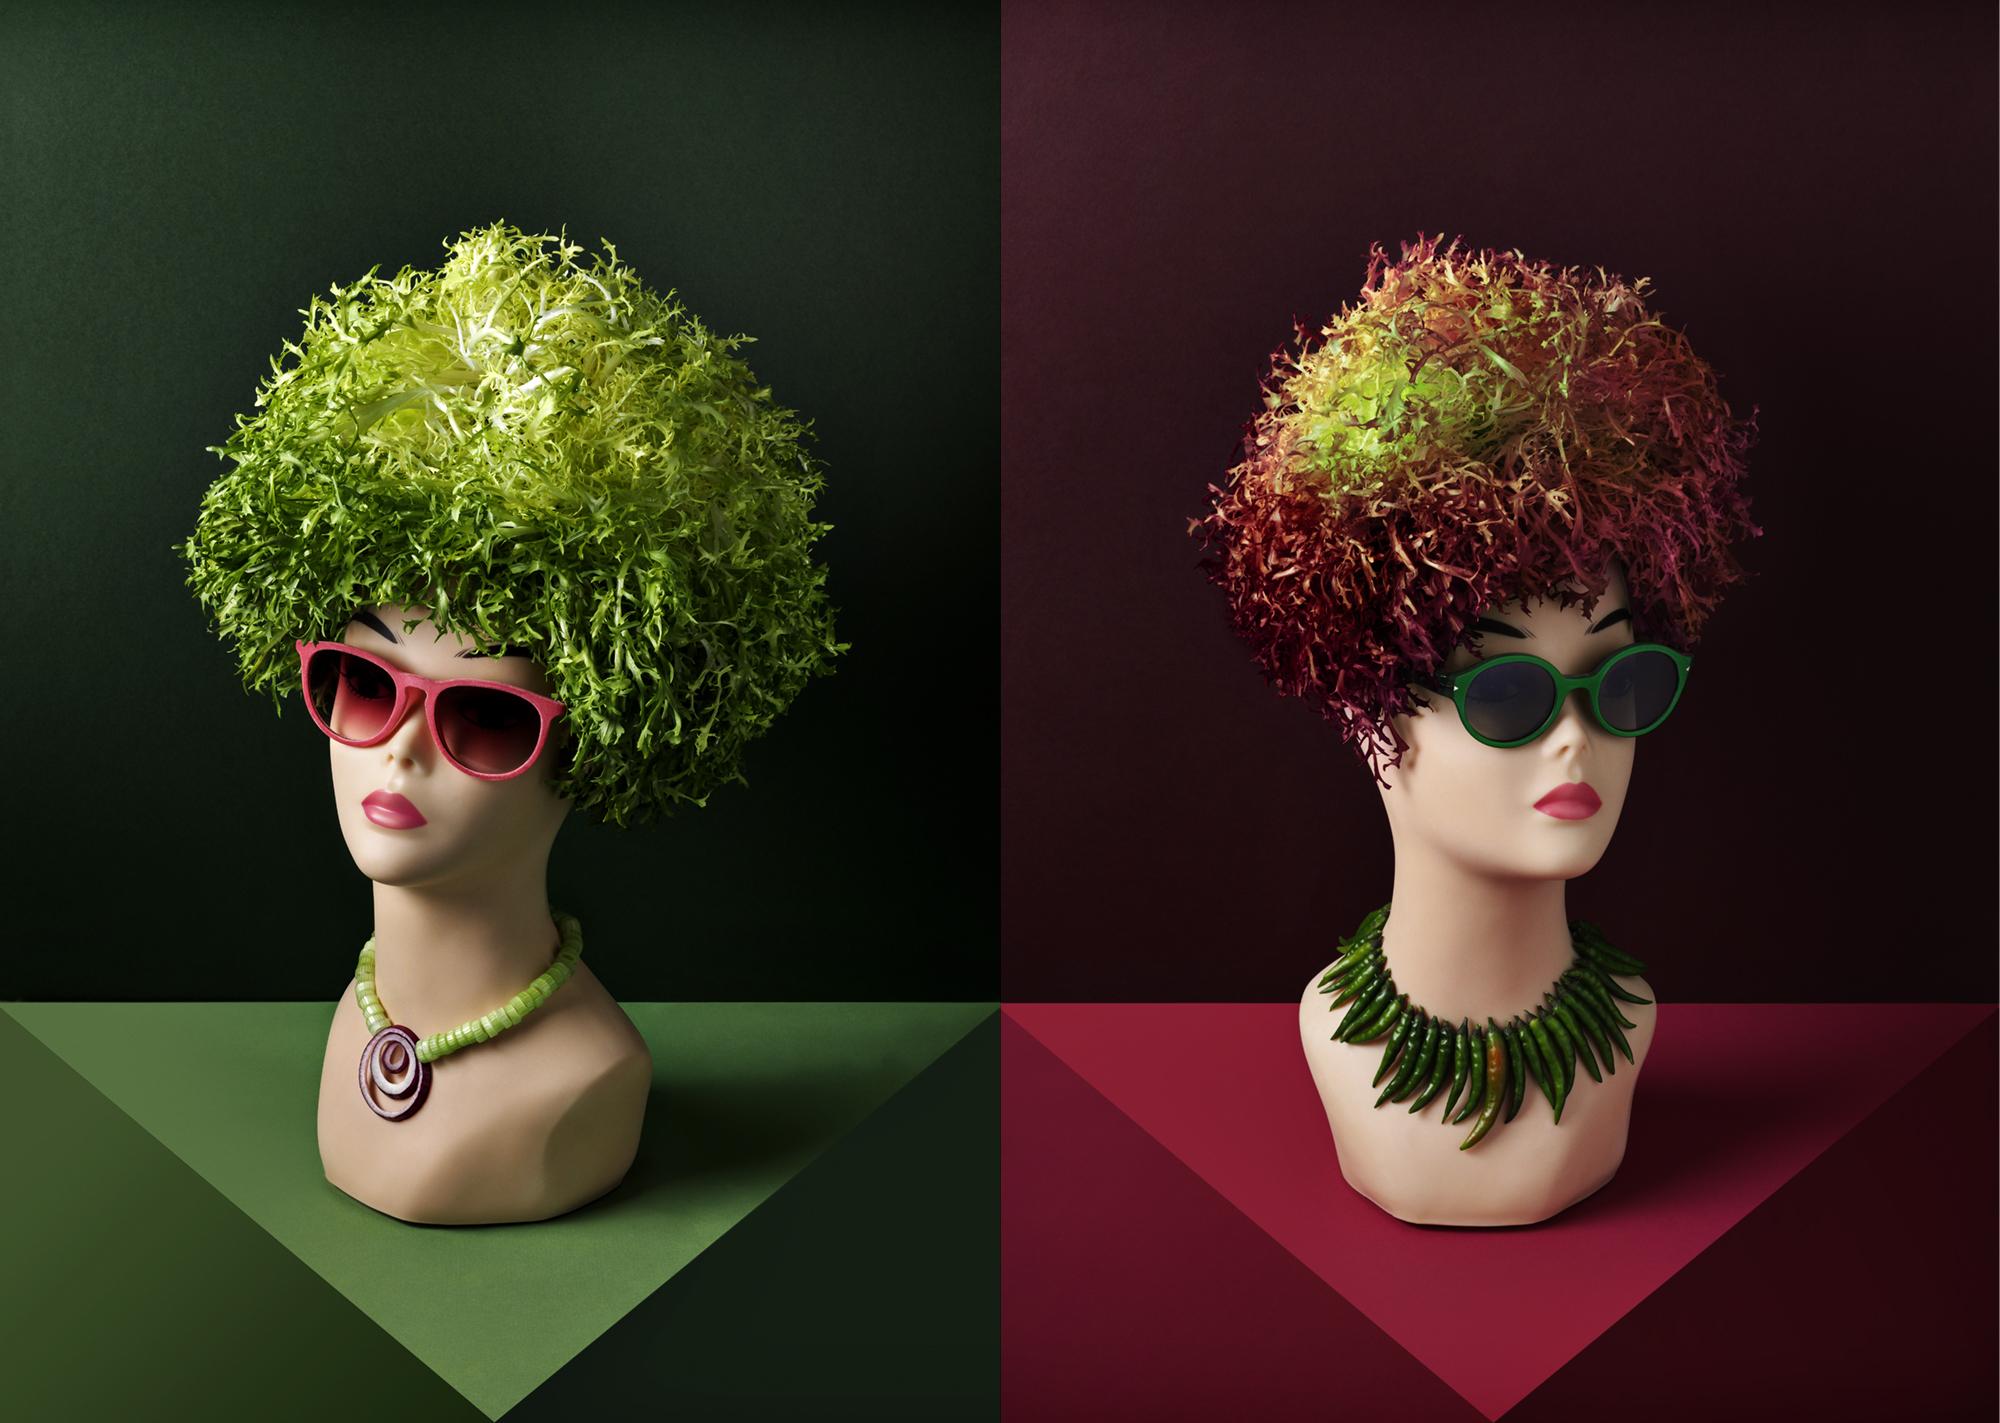 Hilary-Moore-food-Photography-lettuce heads-slideshowB.jpg